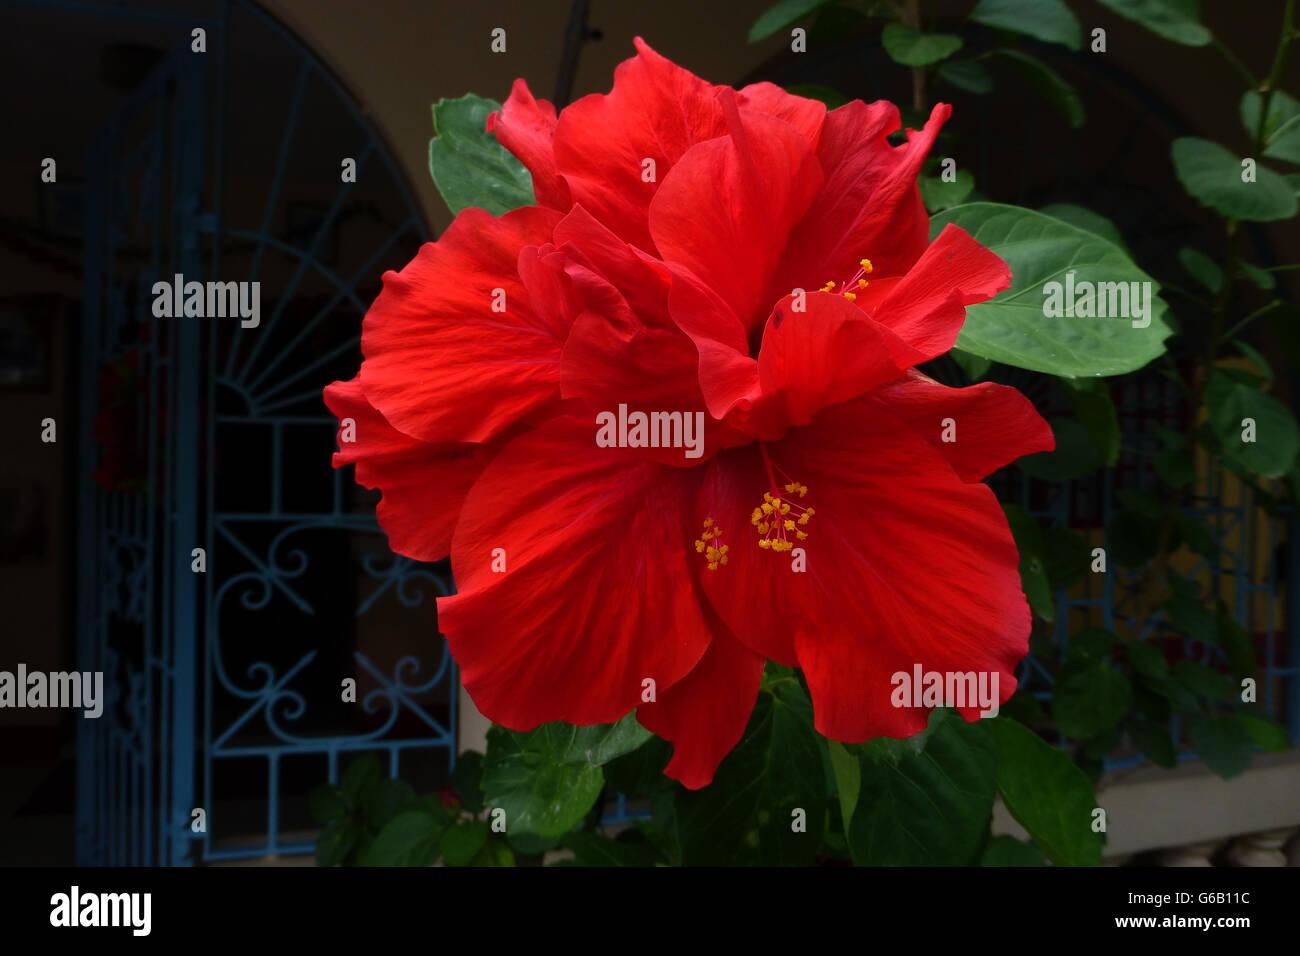 Hibiscus flowers popular across jamaica and many caribbean stock hibiscus flowers popular across jamaica and many caribbean islandses in several varieties red being the most common izmirmasajfo